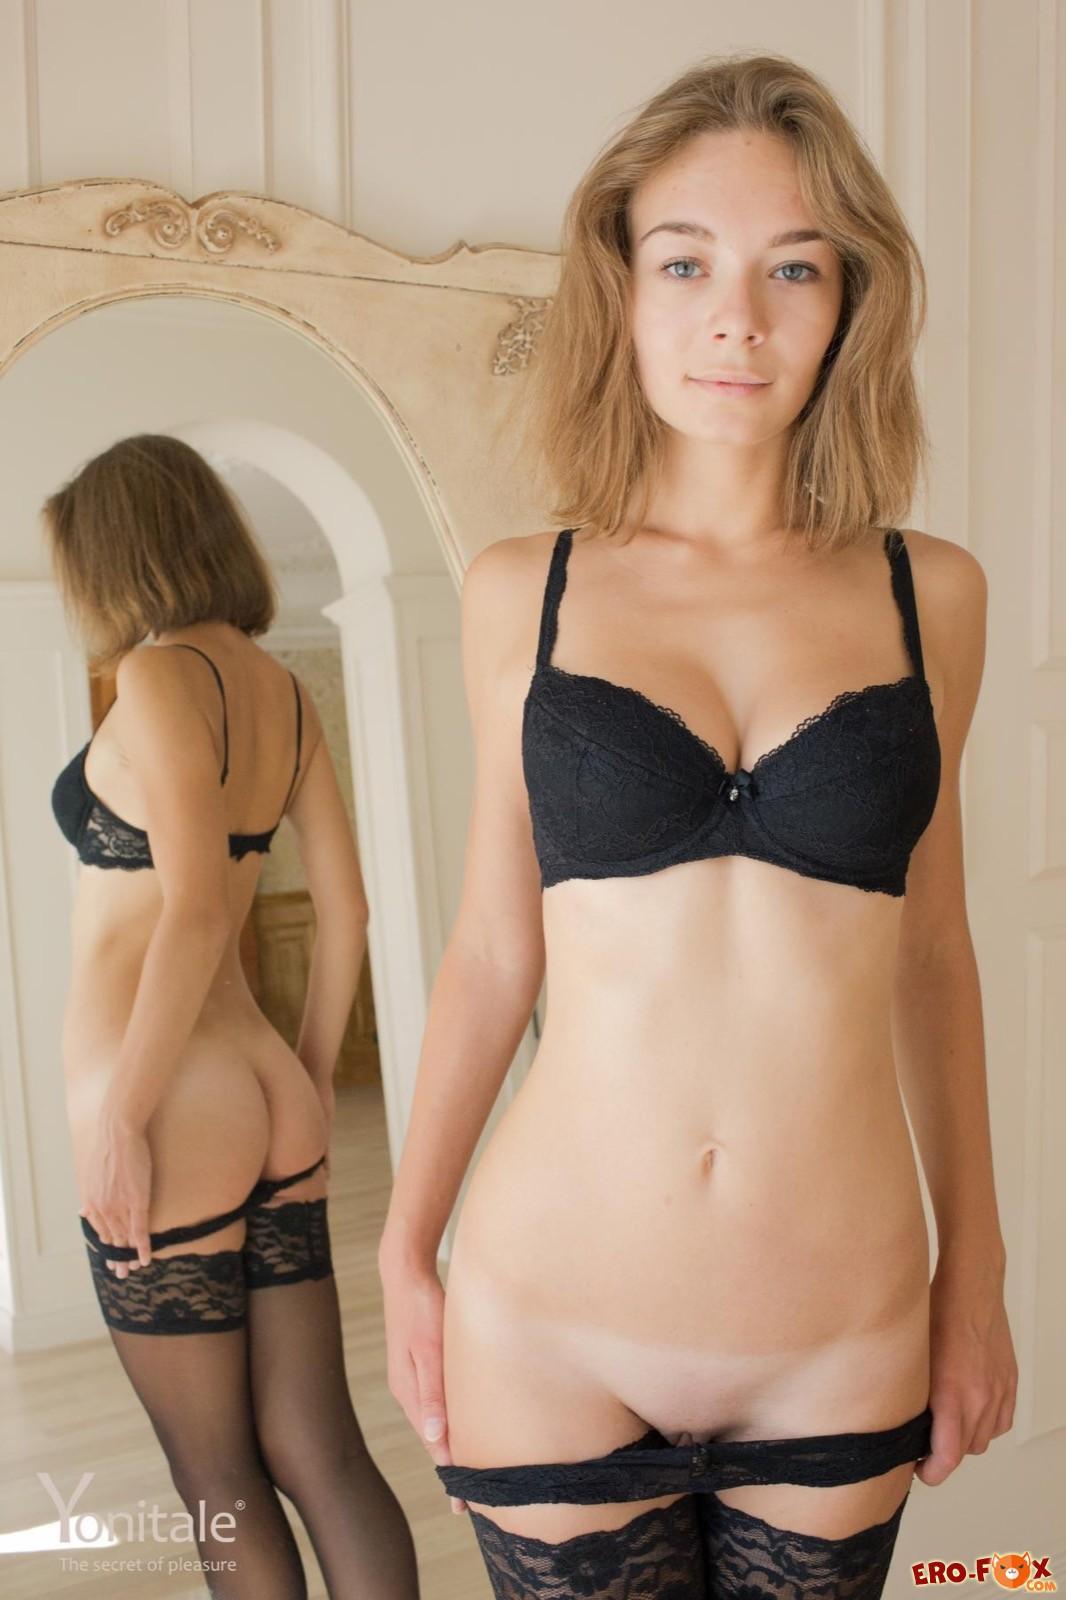 Голая девица в чулках перед зеркалом